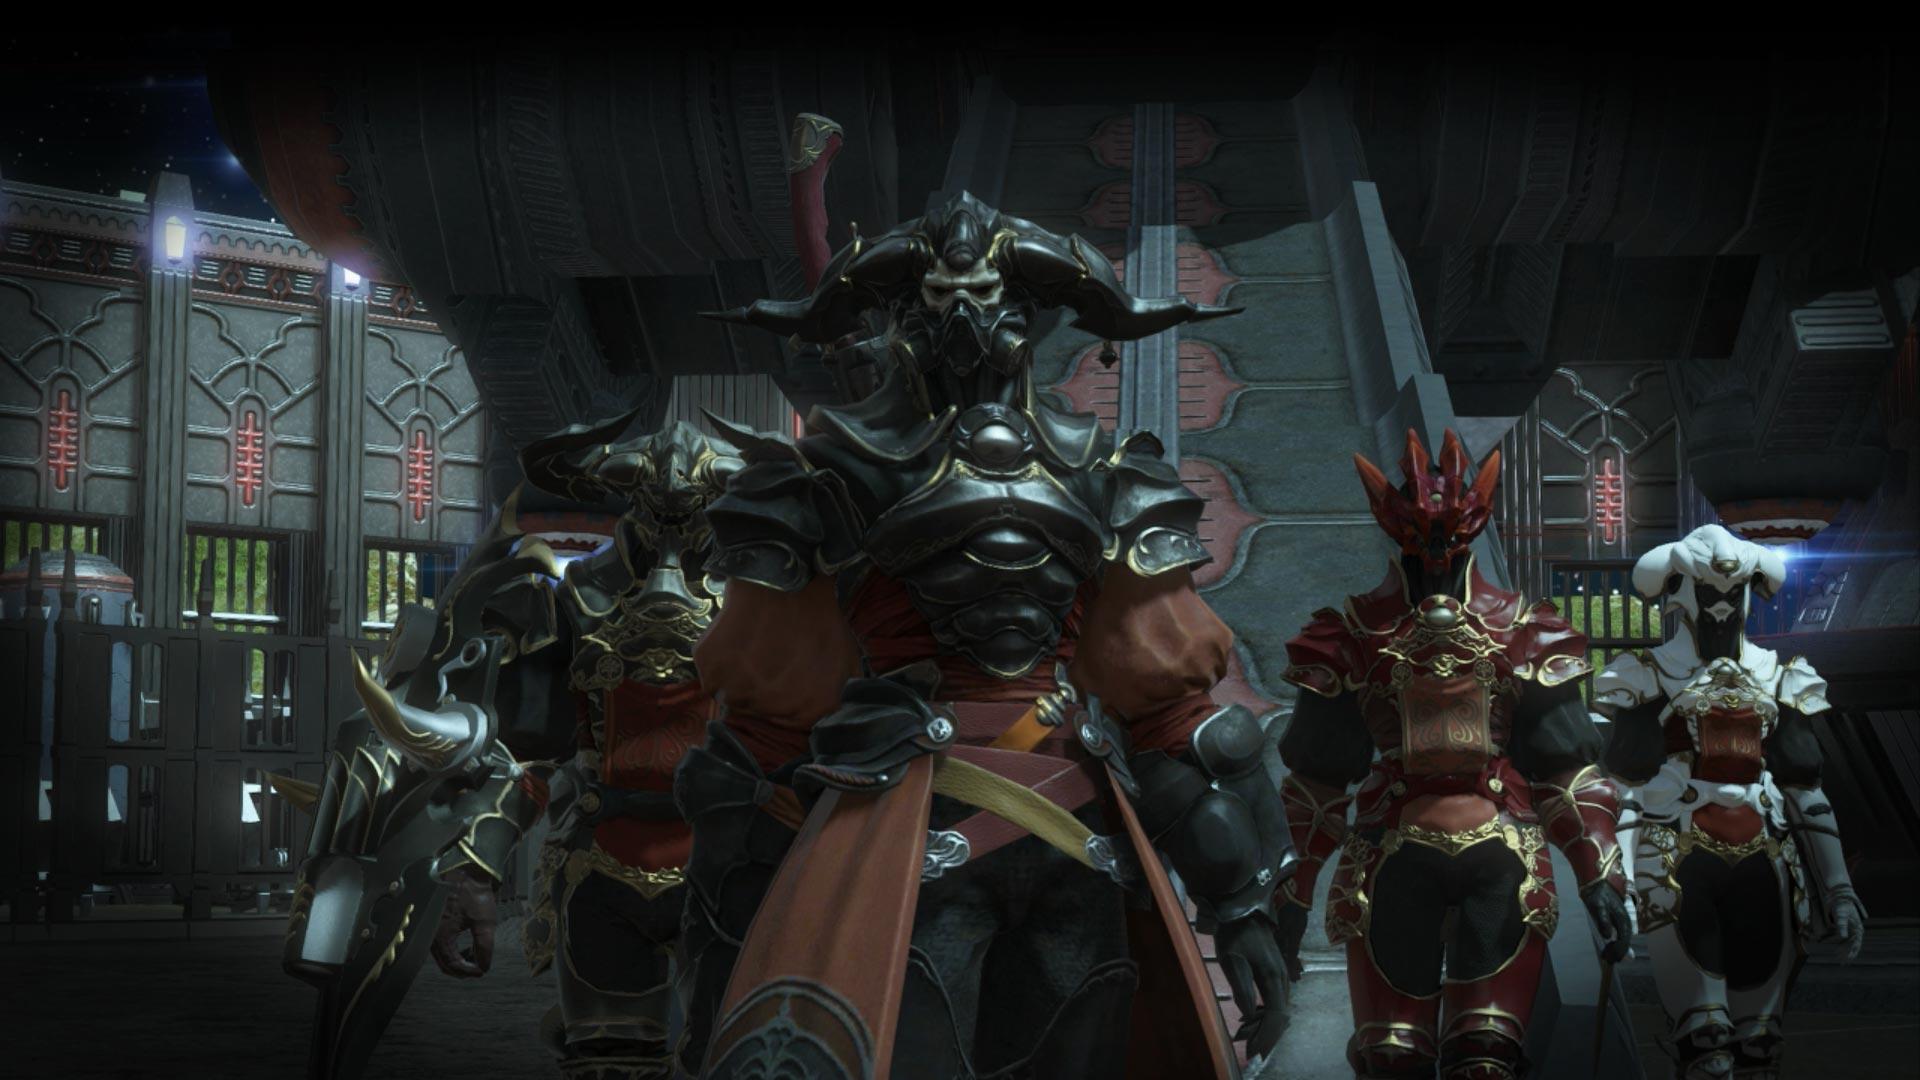 American Netf Final Fantasy Xiv | Garroshboosting